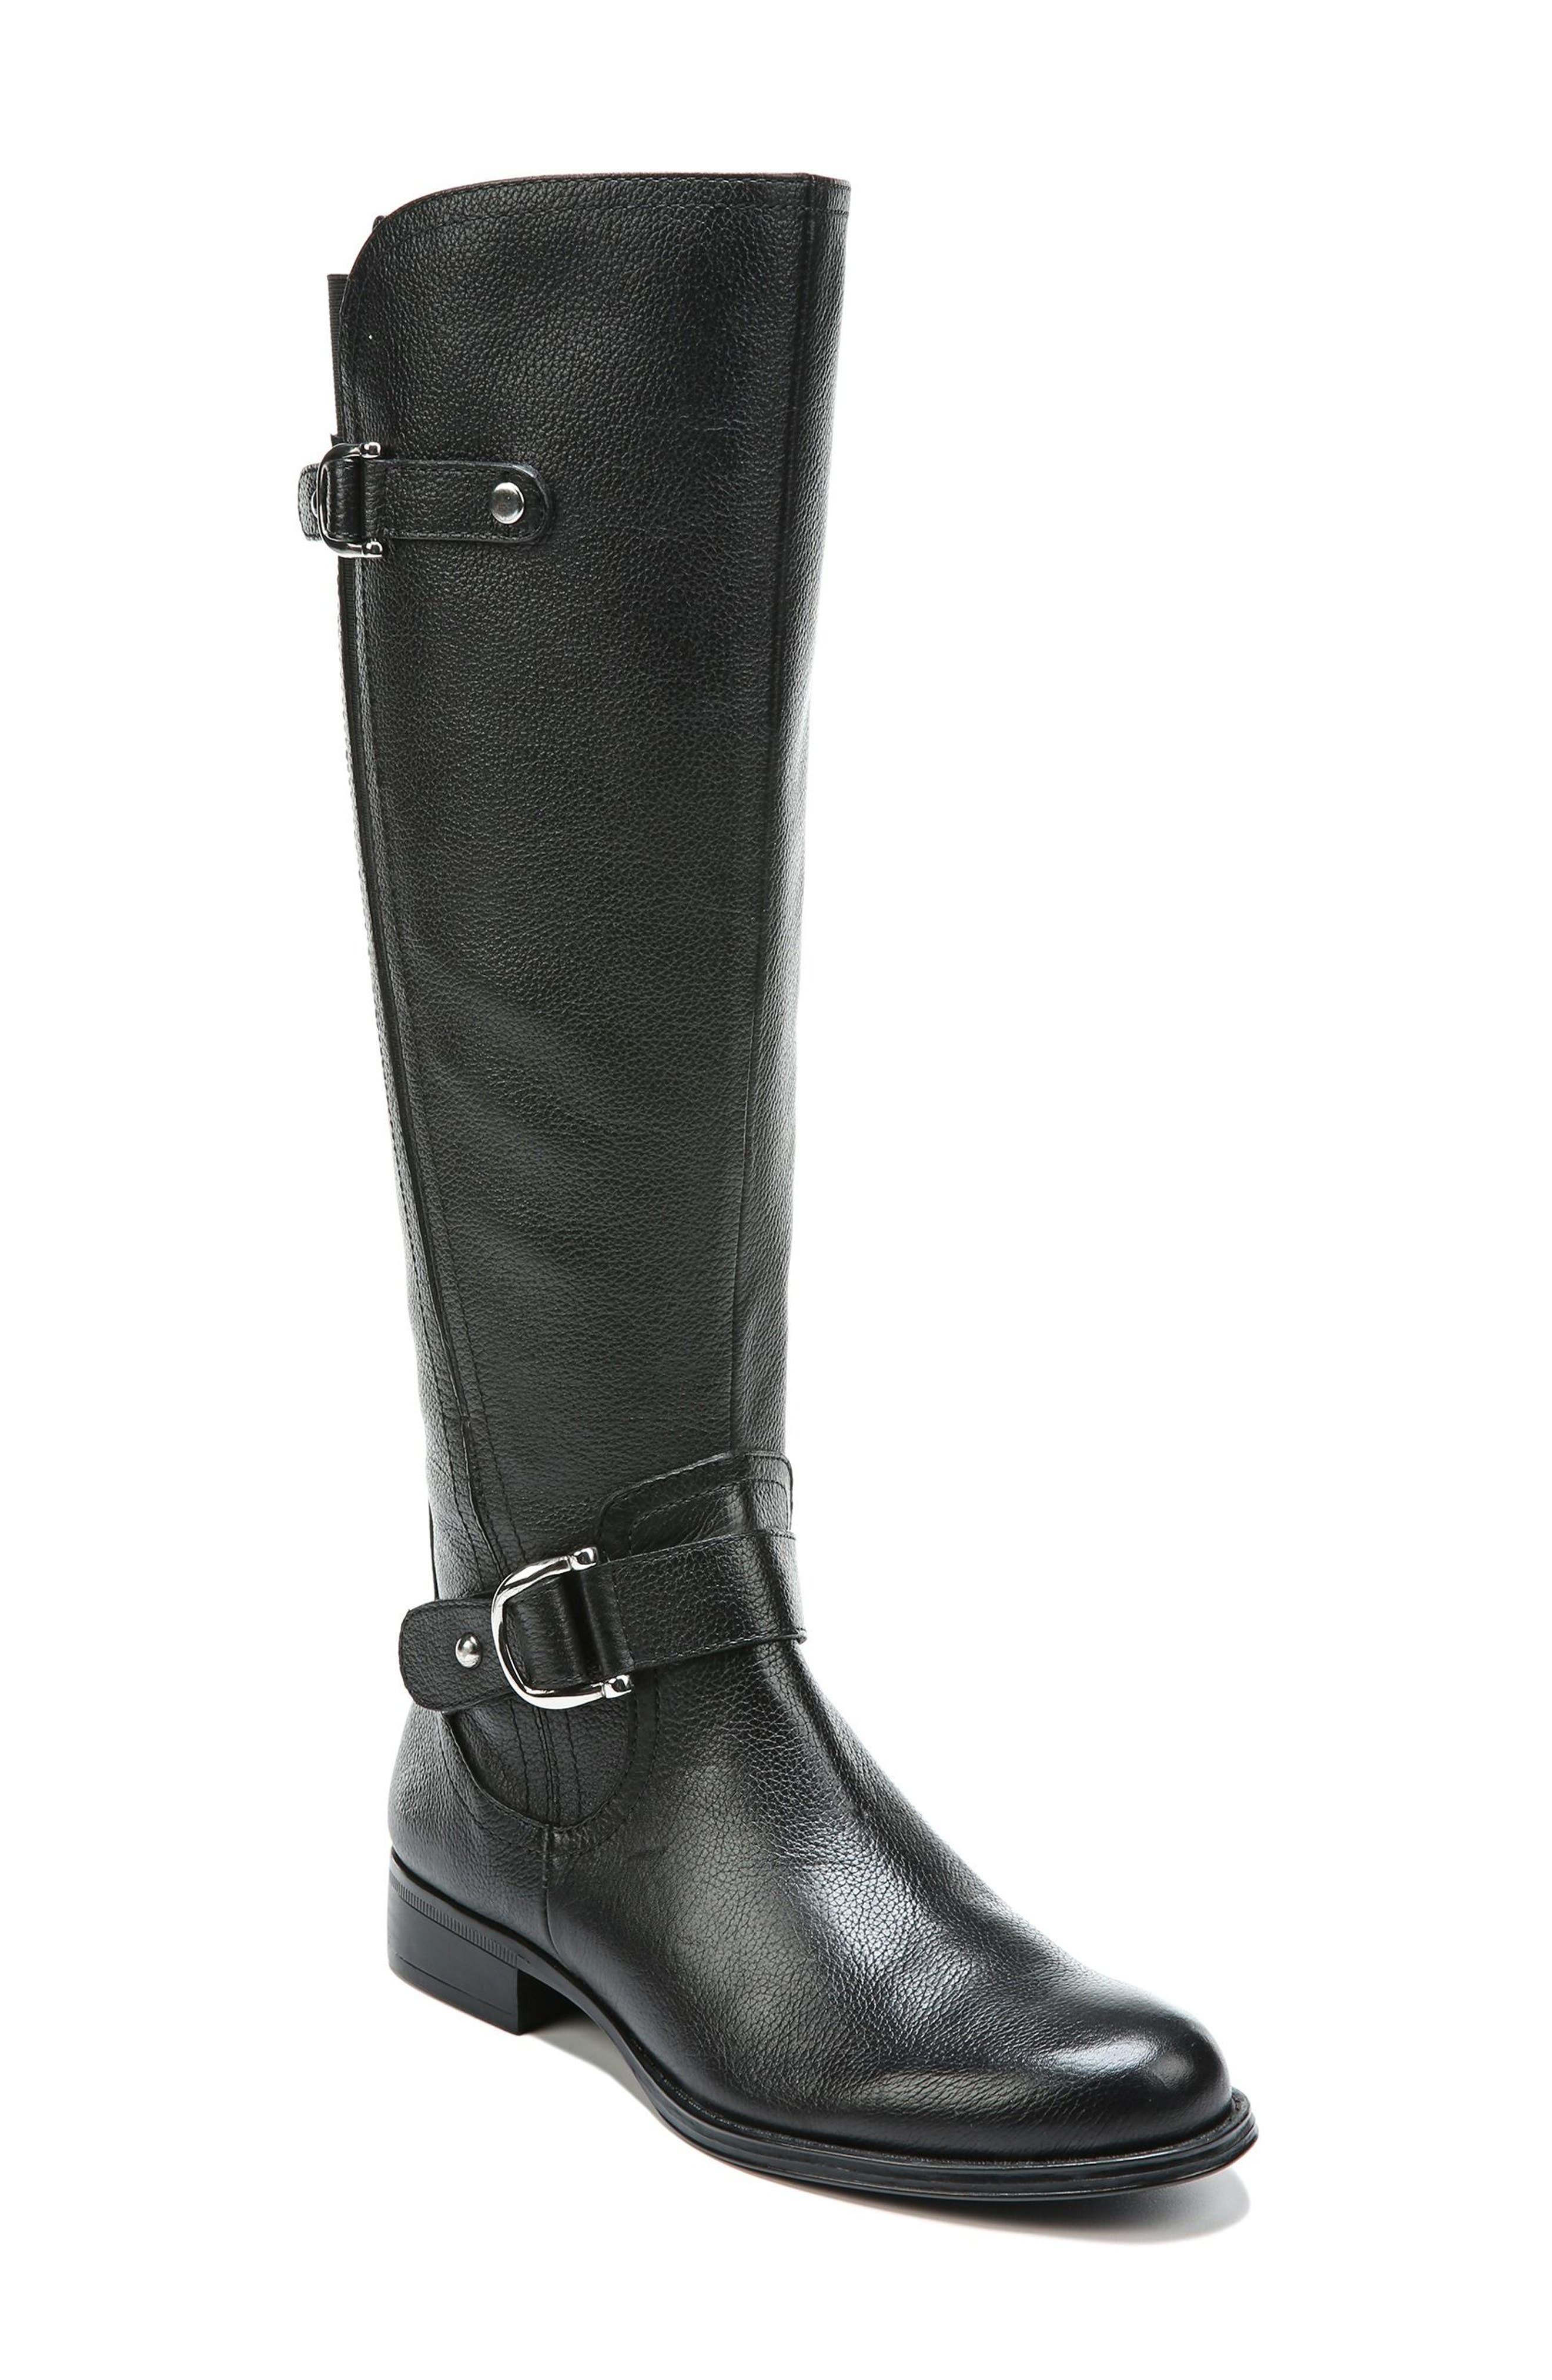 Naturalizer Jenelle Tall Boot Regular Calf W - Black